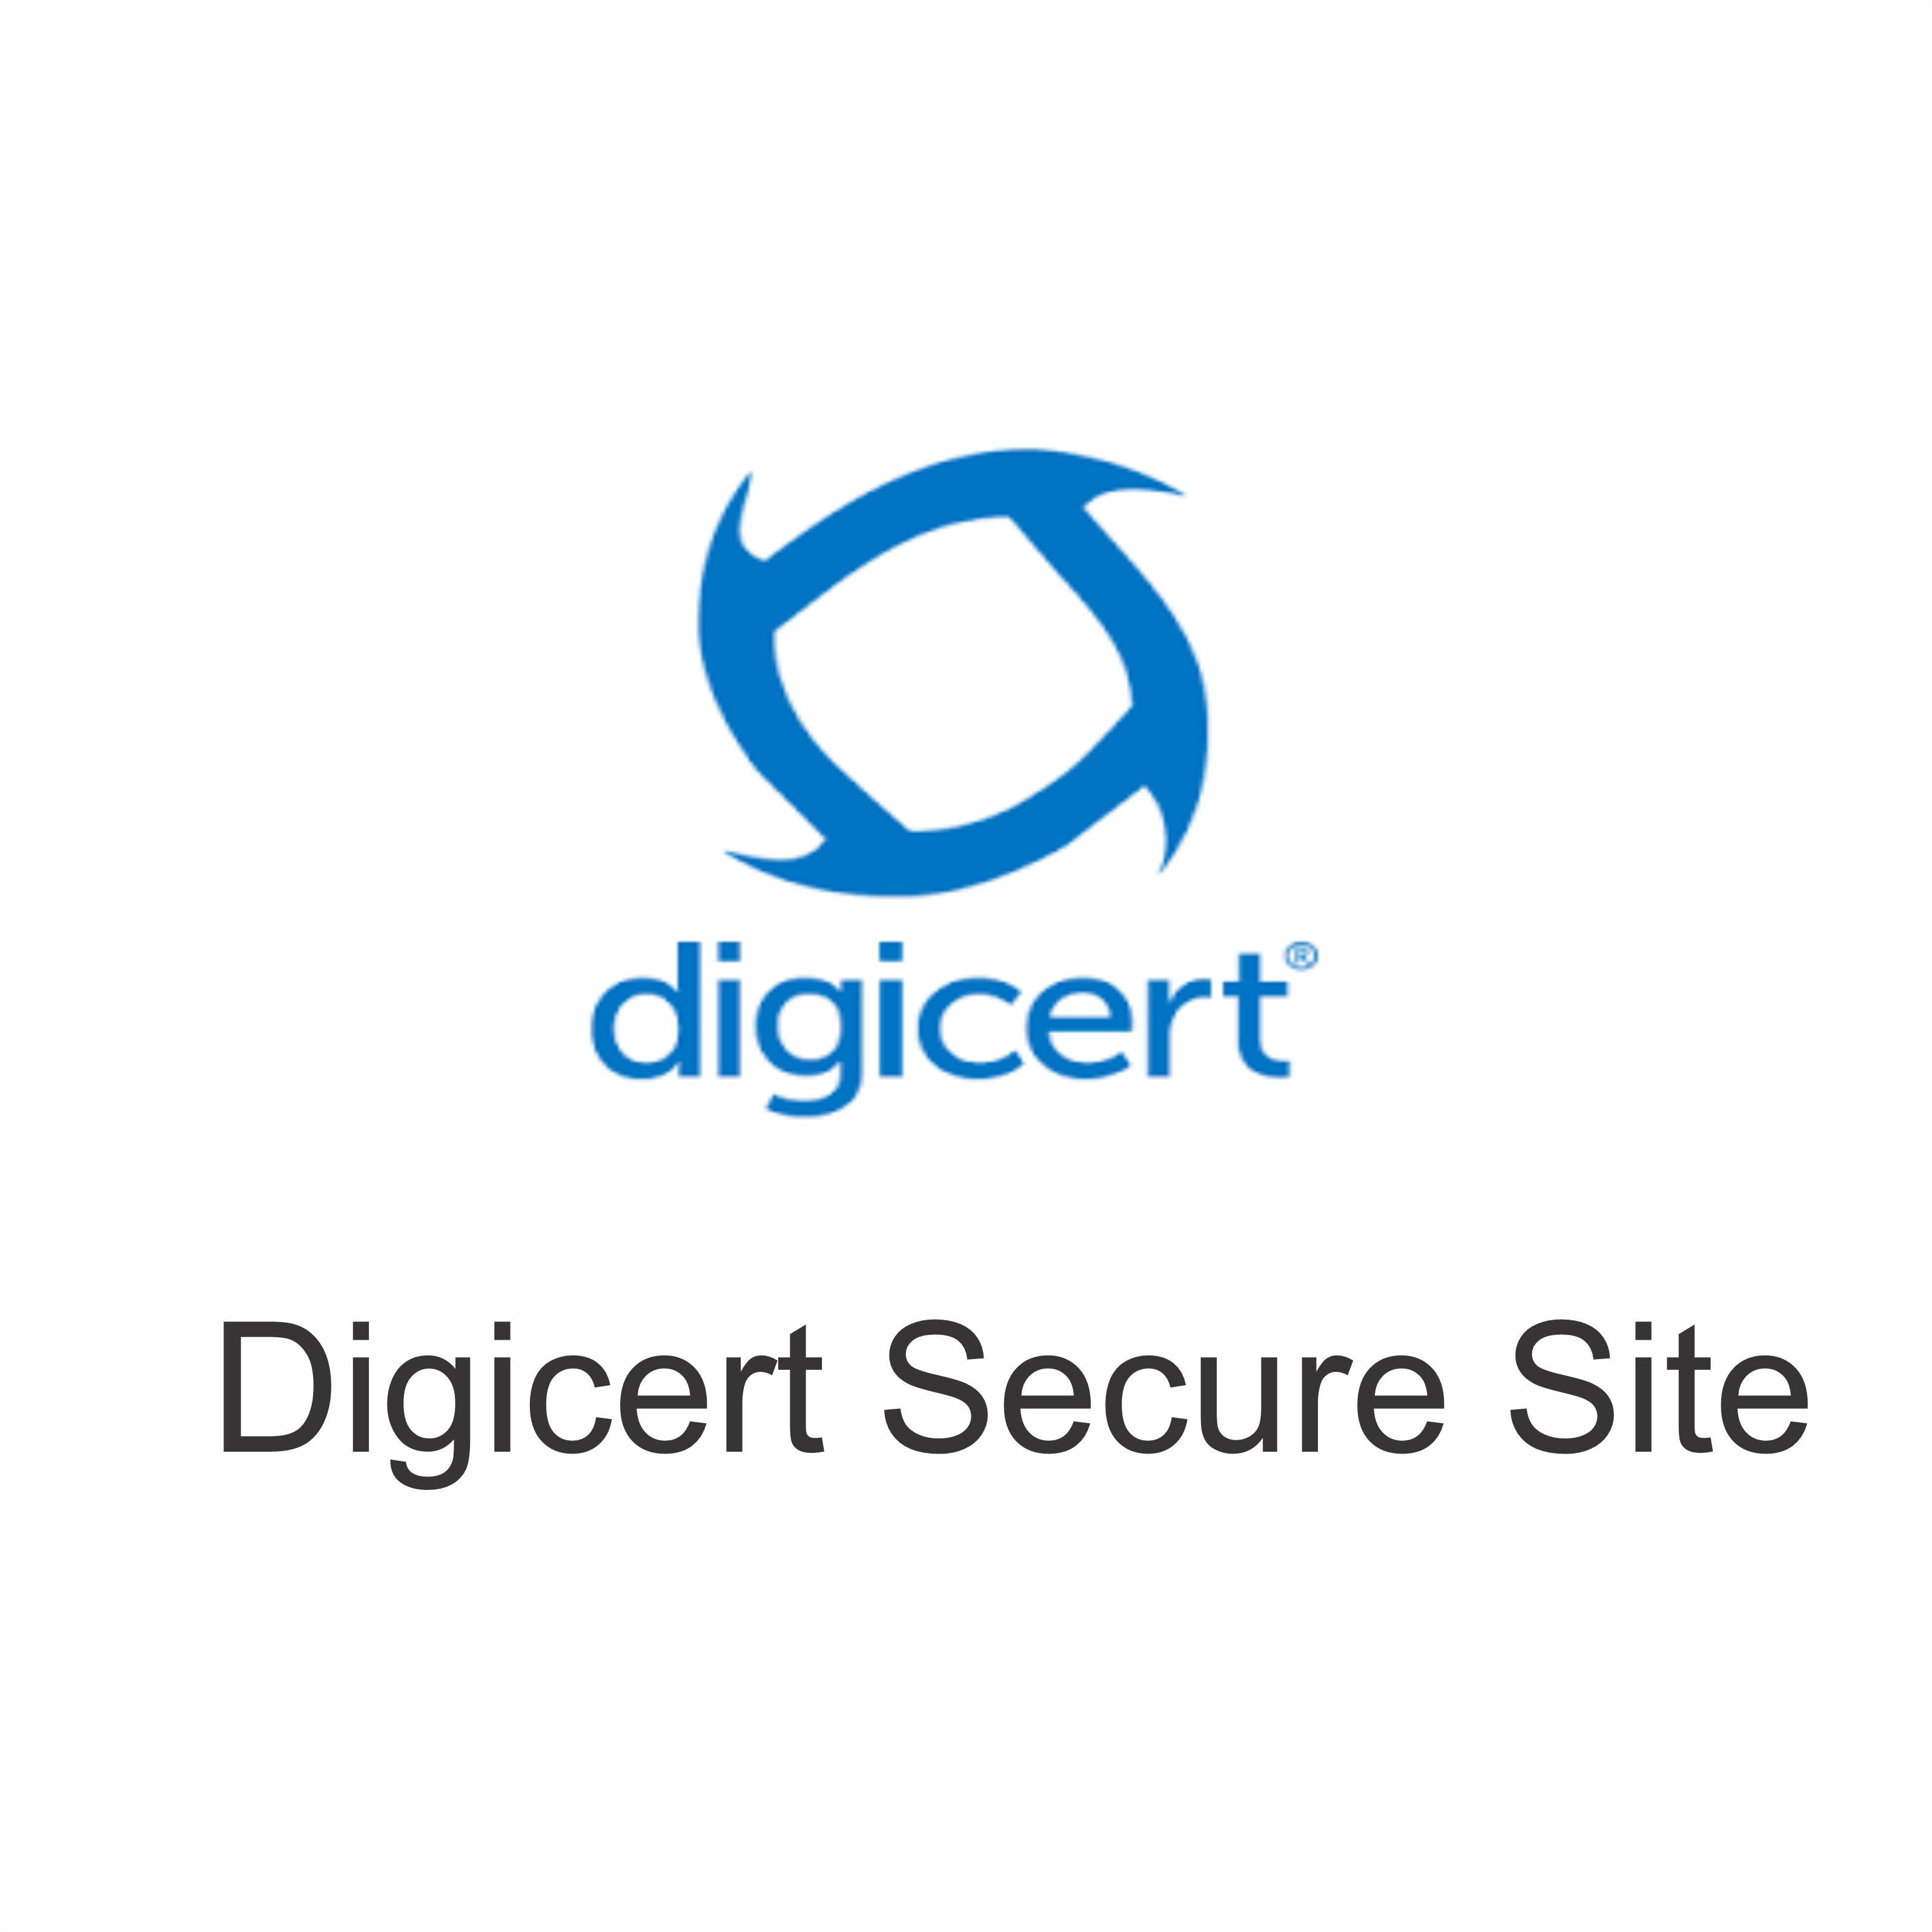 DigiCert Secure Site